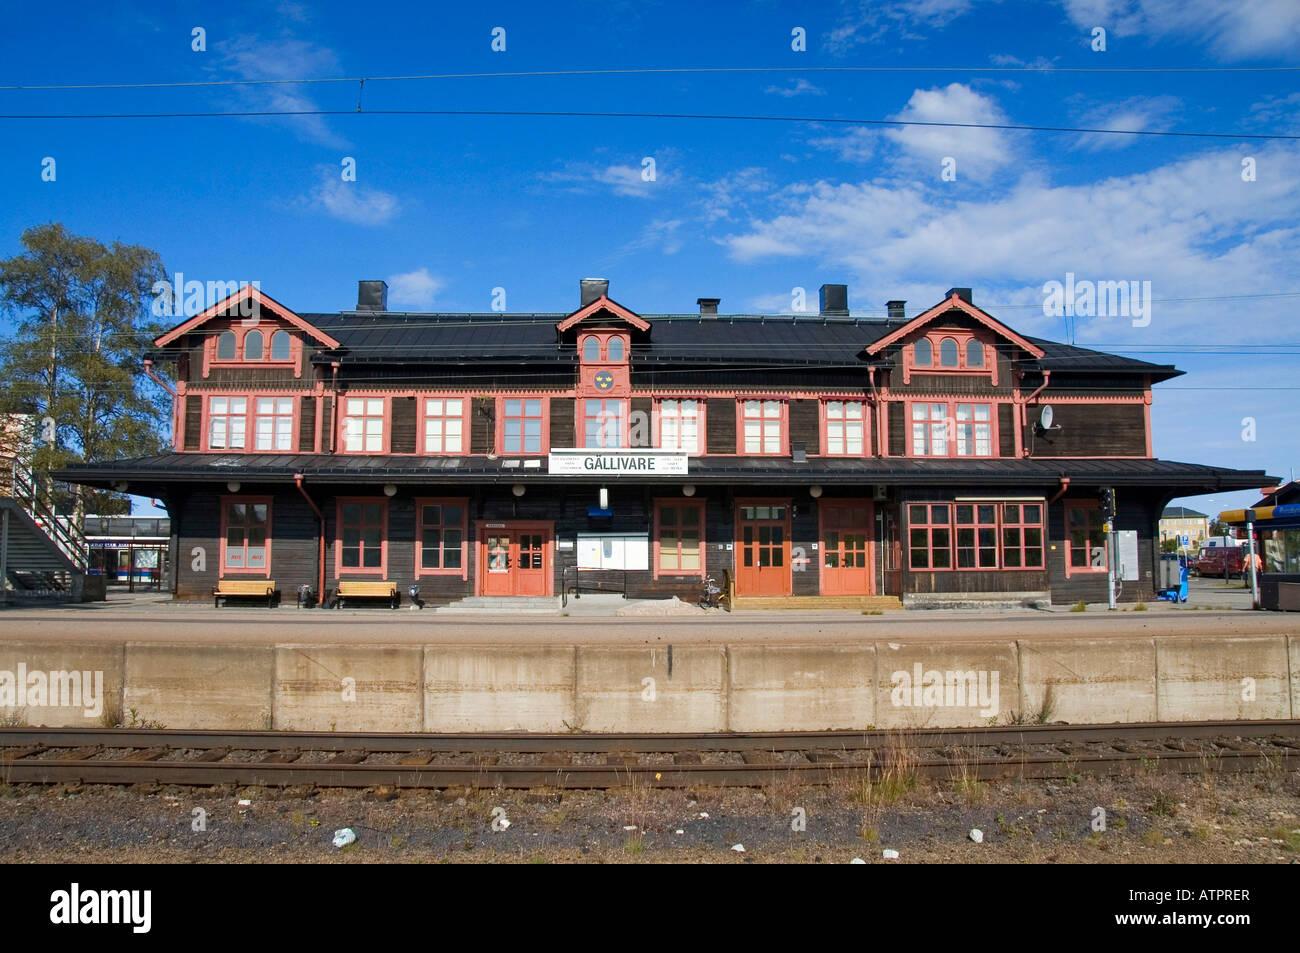 Railway station / Gallivare - Stock Image